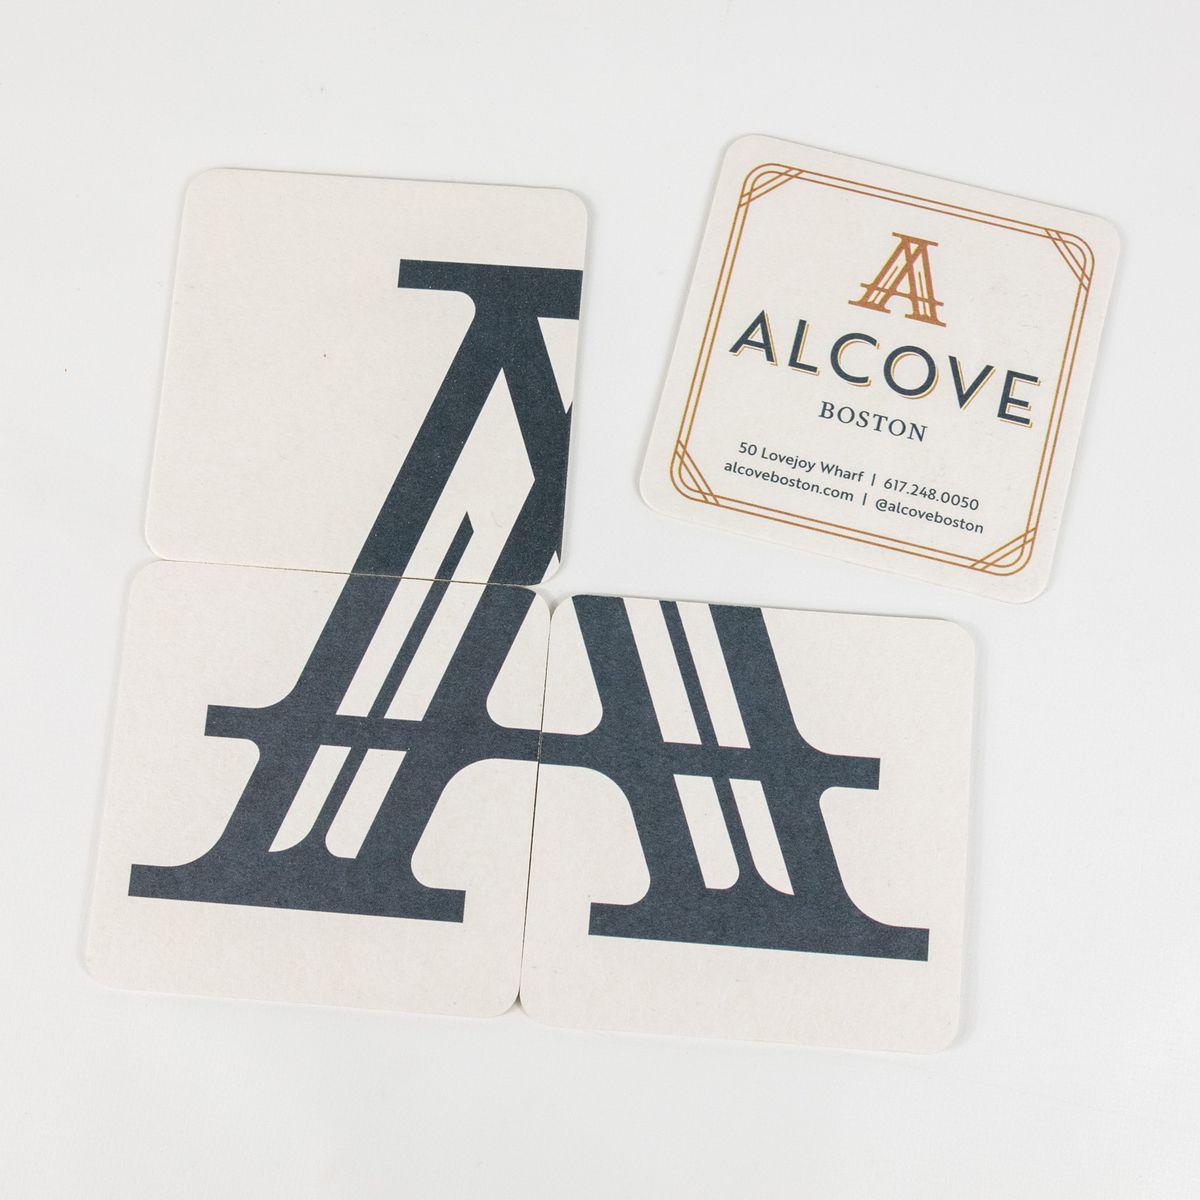 Alcove coasters